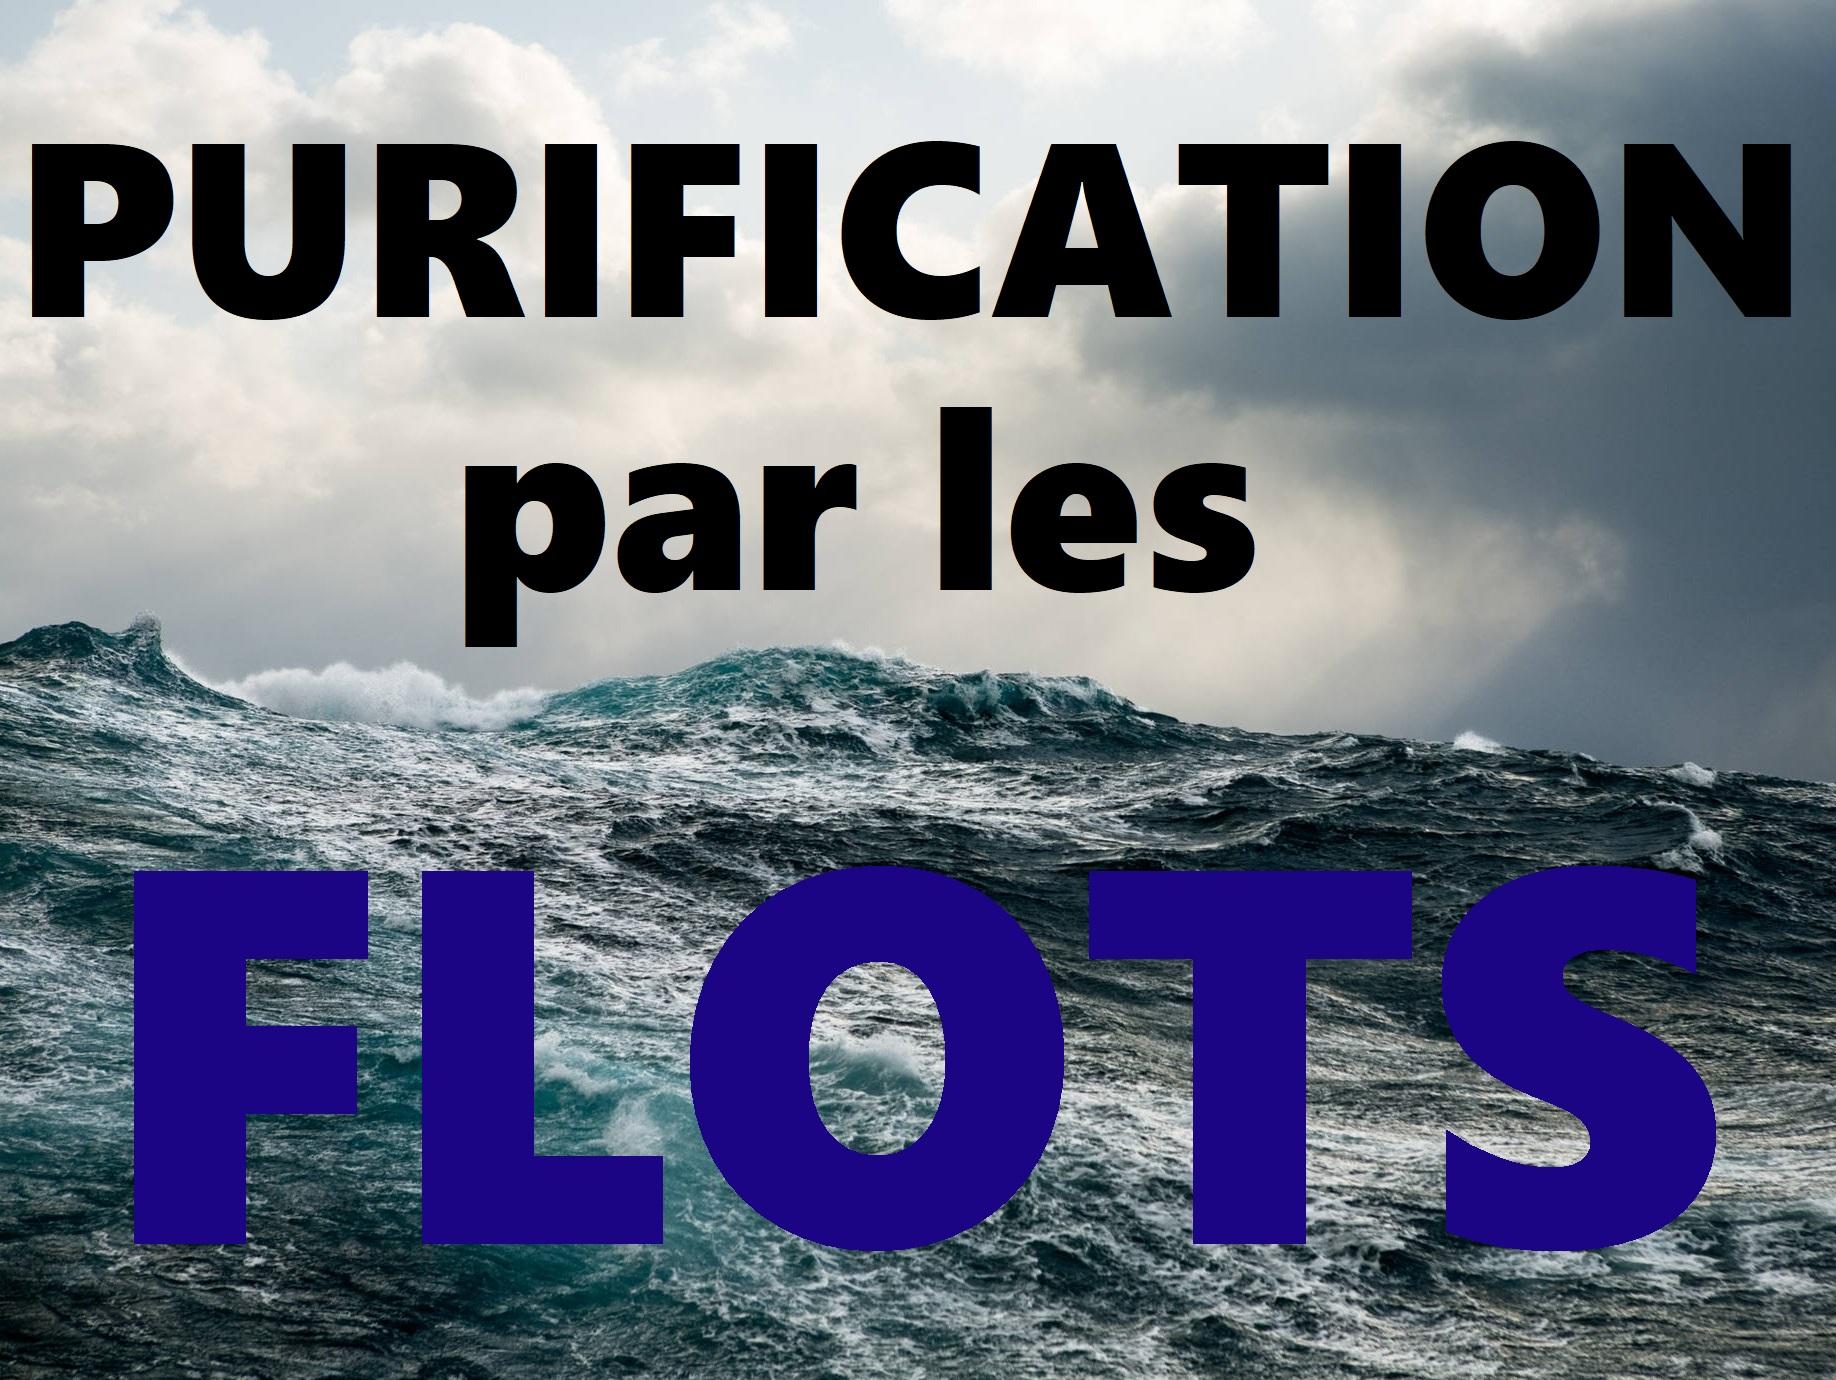 Sticker jvc oceans mers eaux purification cthulhu vague tsunami raz de maree